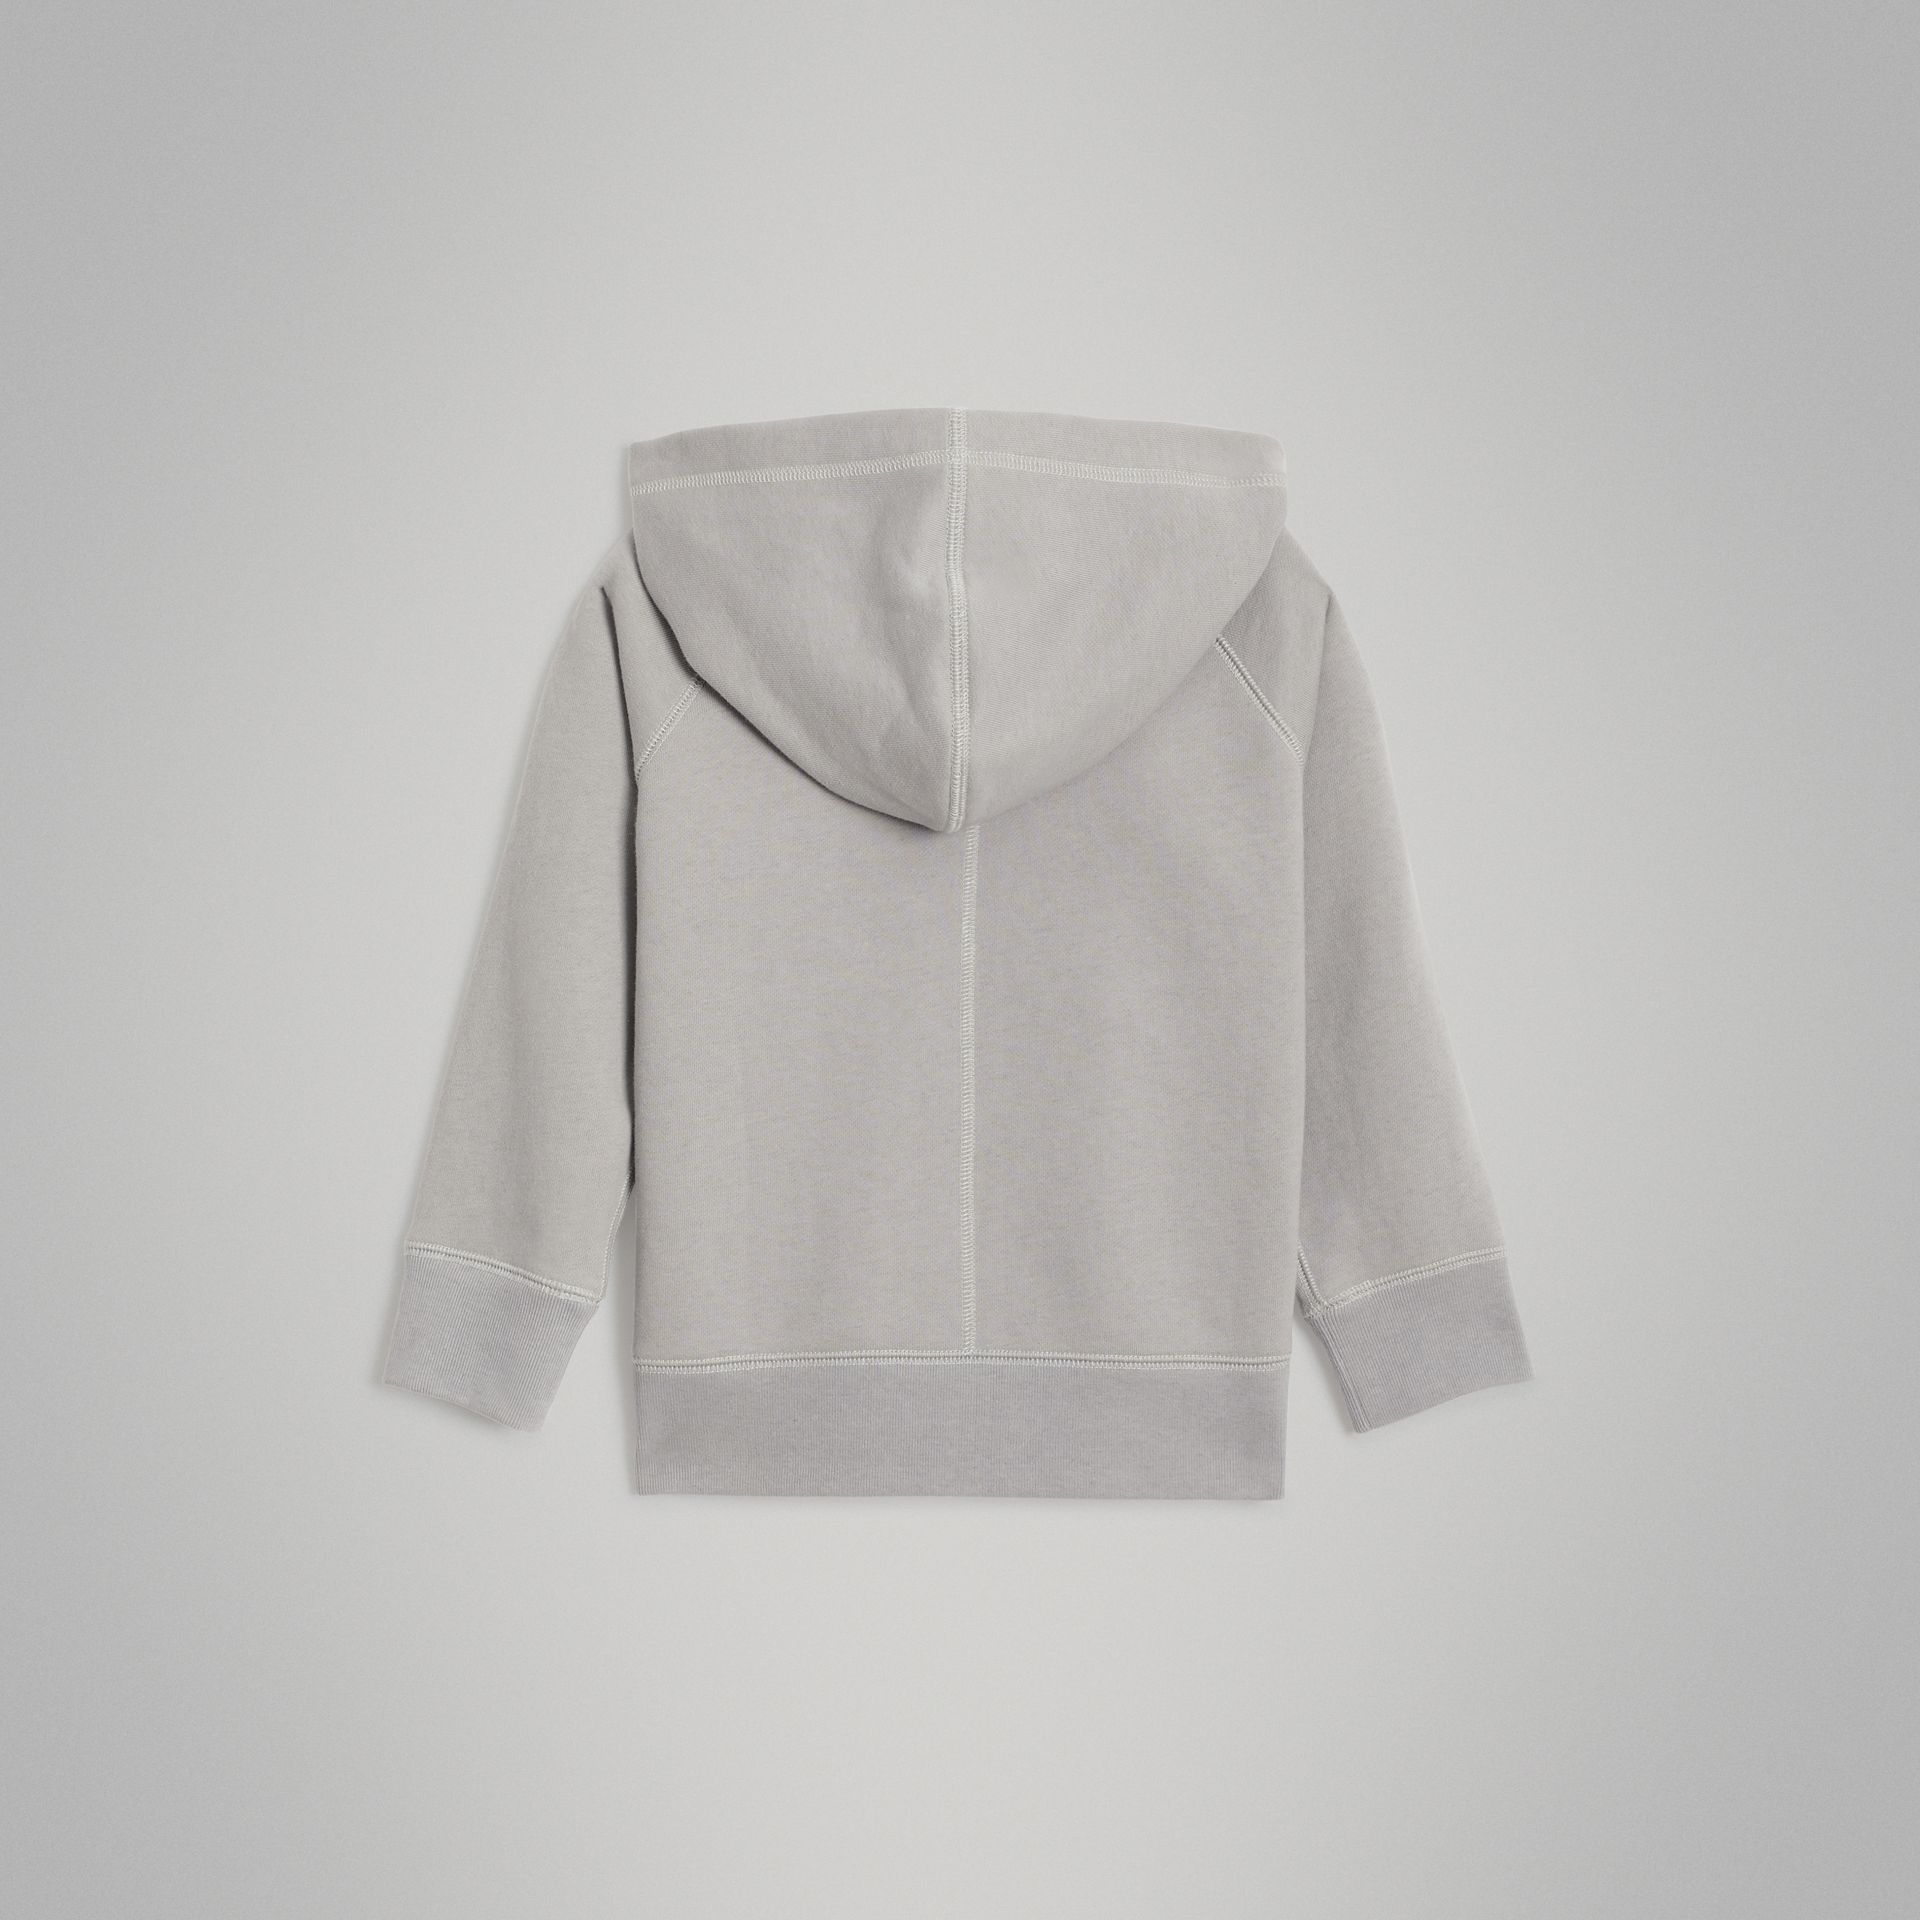 Cotton Jersey Hooded Top in Chalk Grey Melange | Burberry Australia - gallery image 3